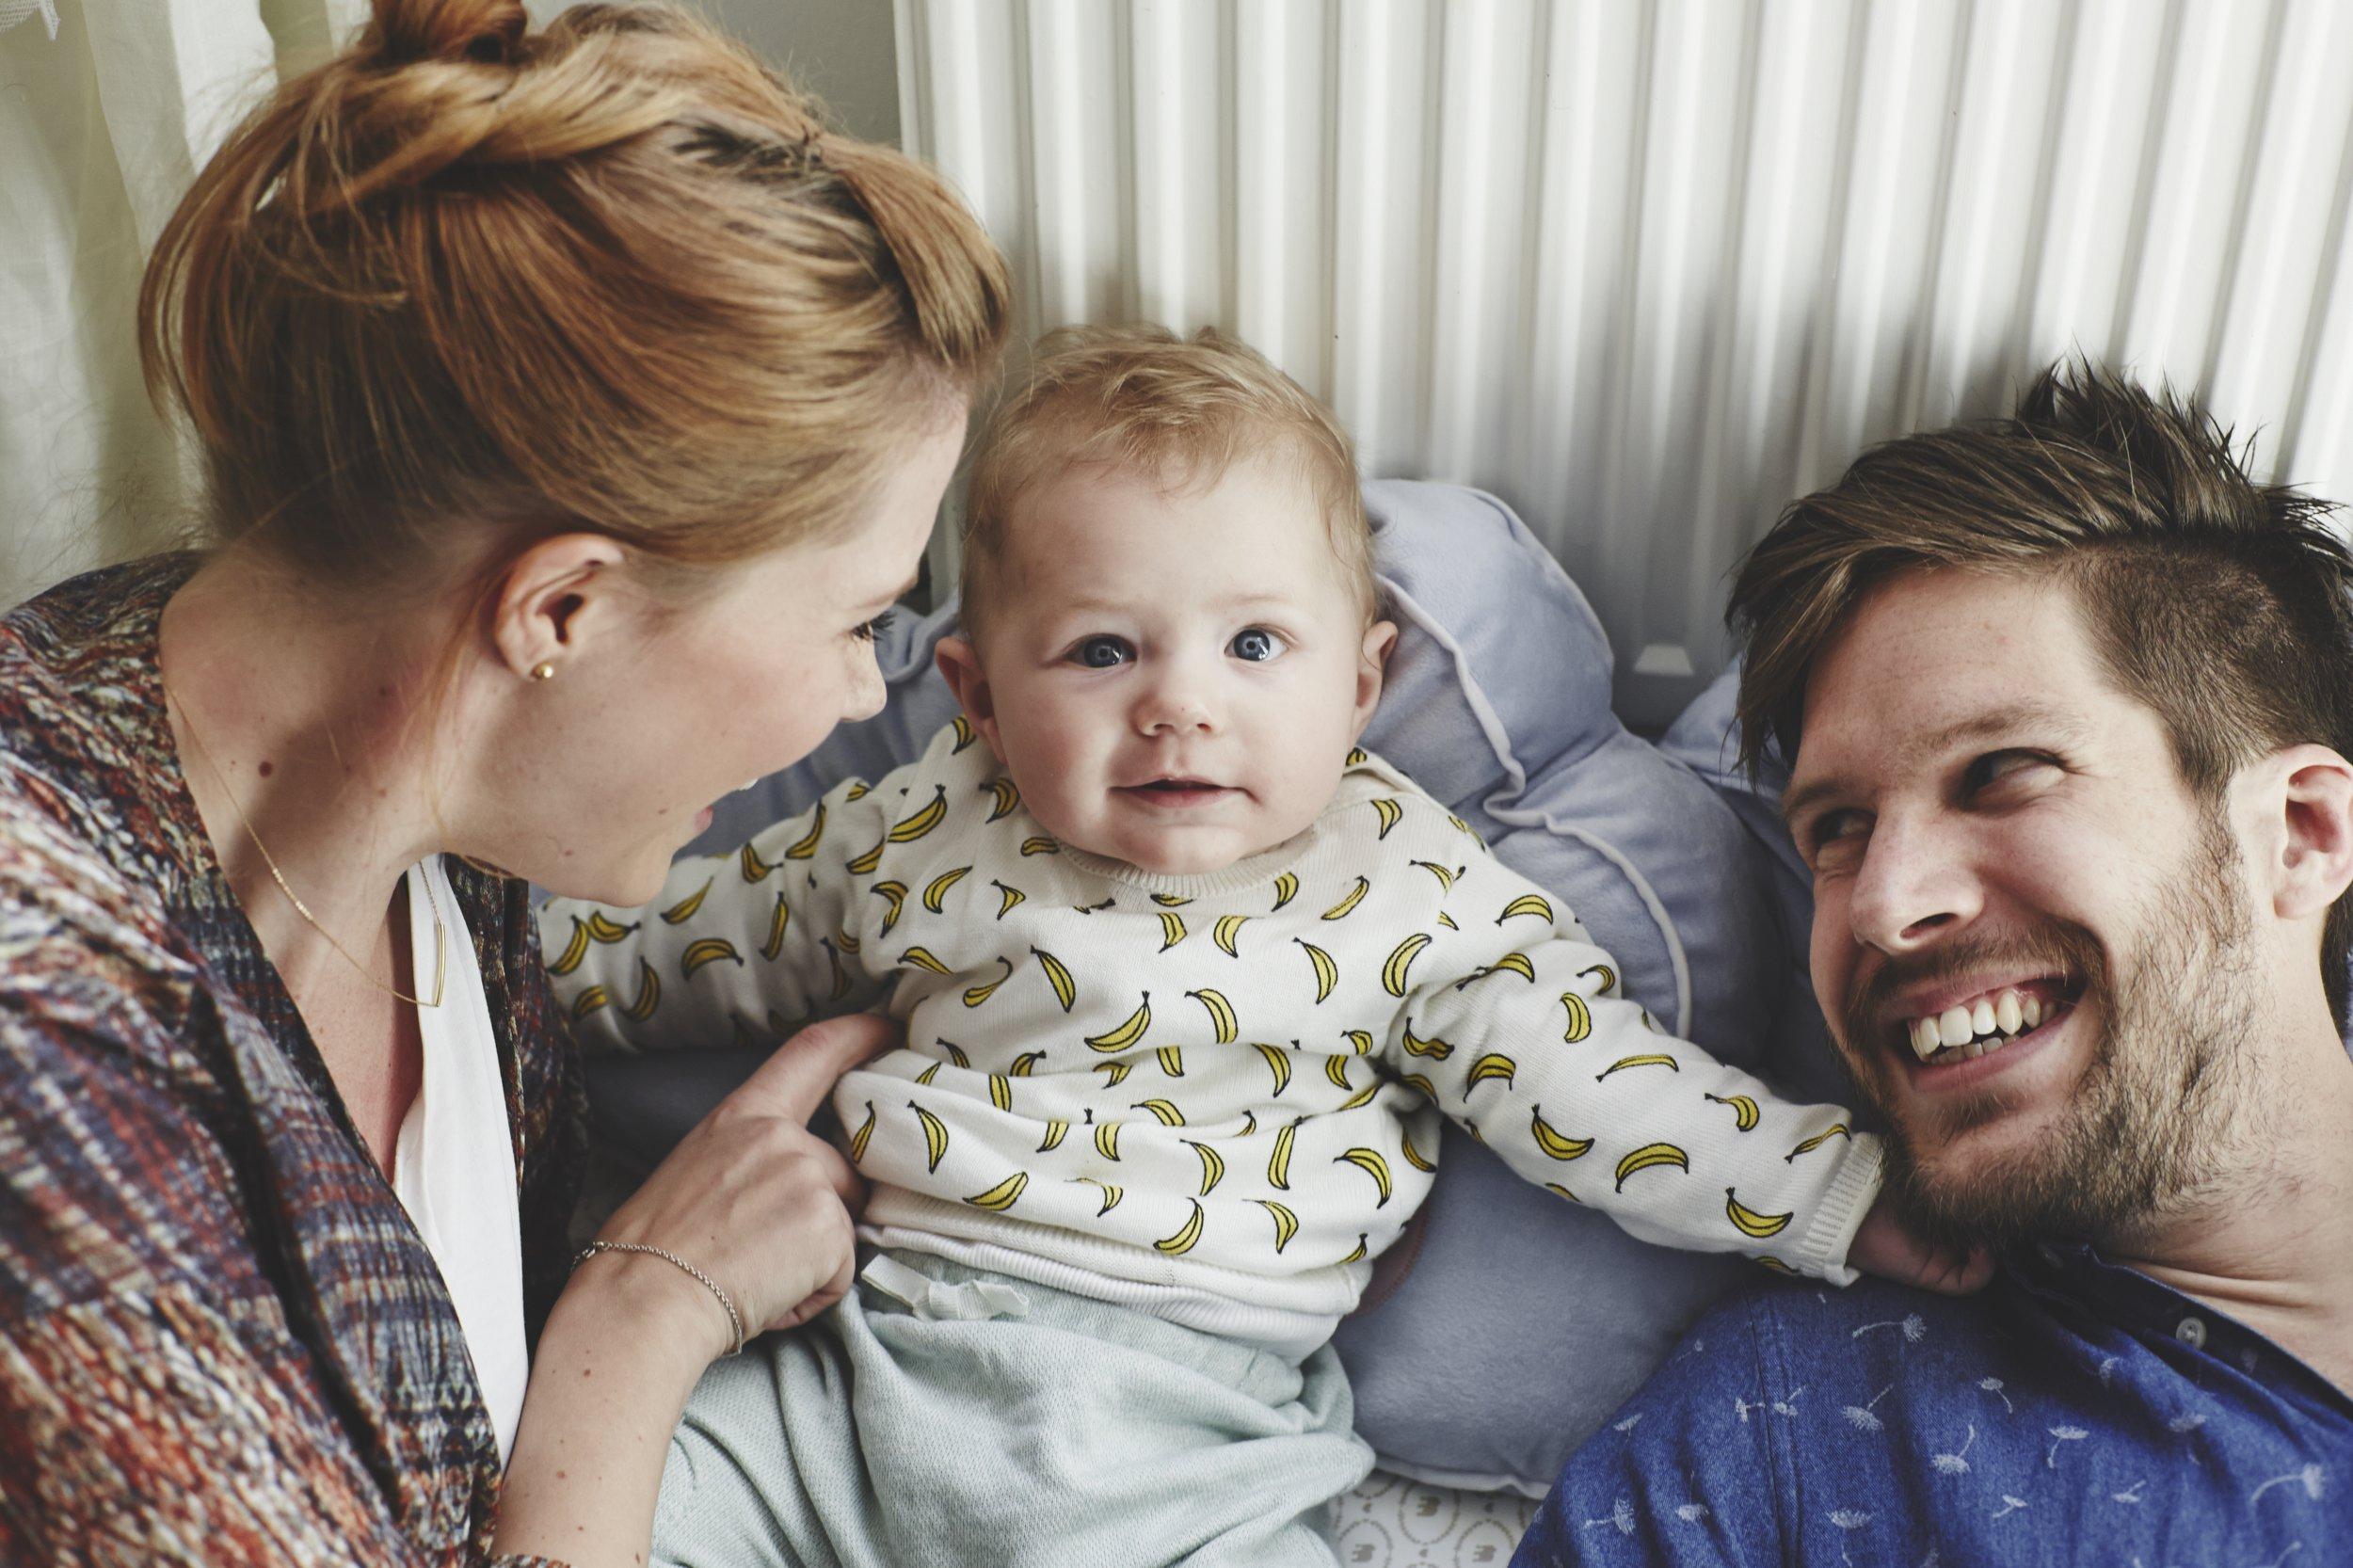 simona scarpaleggia own the way you live paternity leave